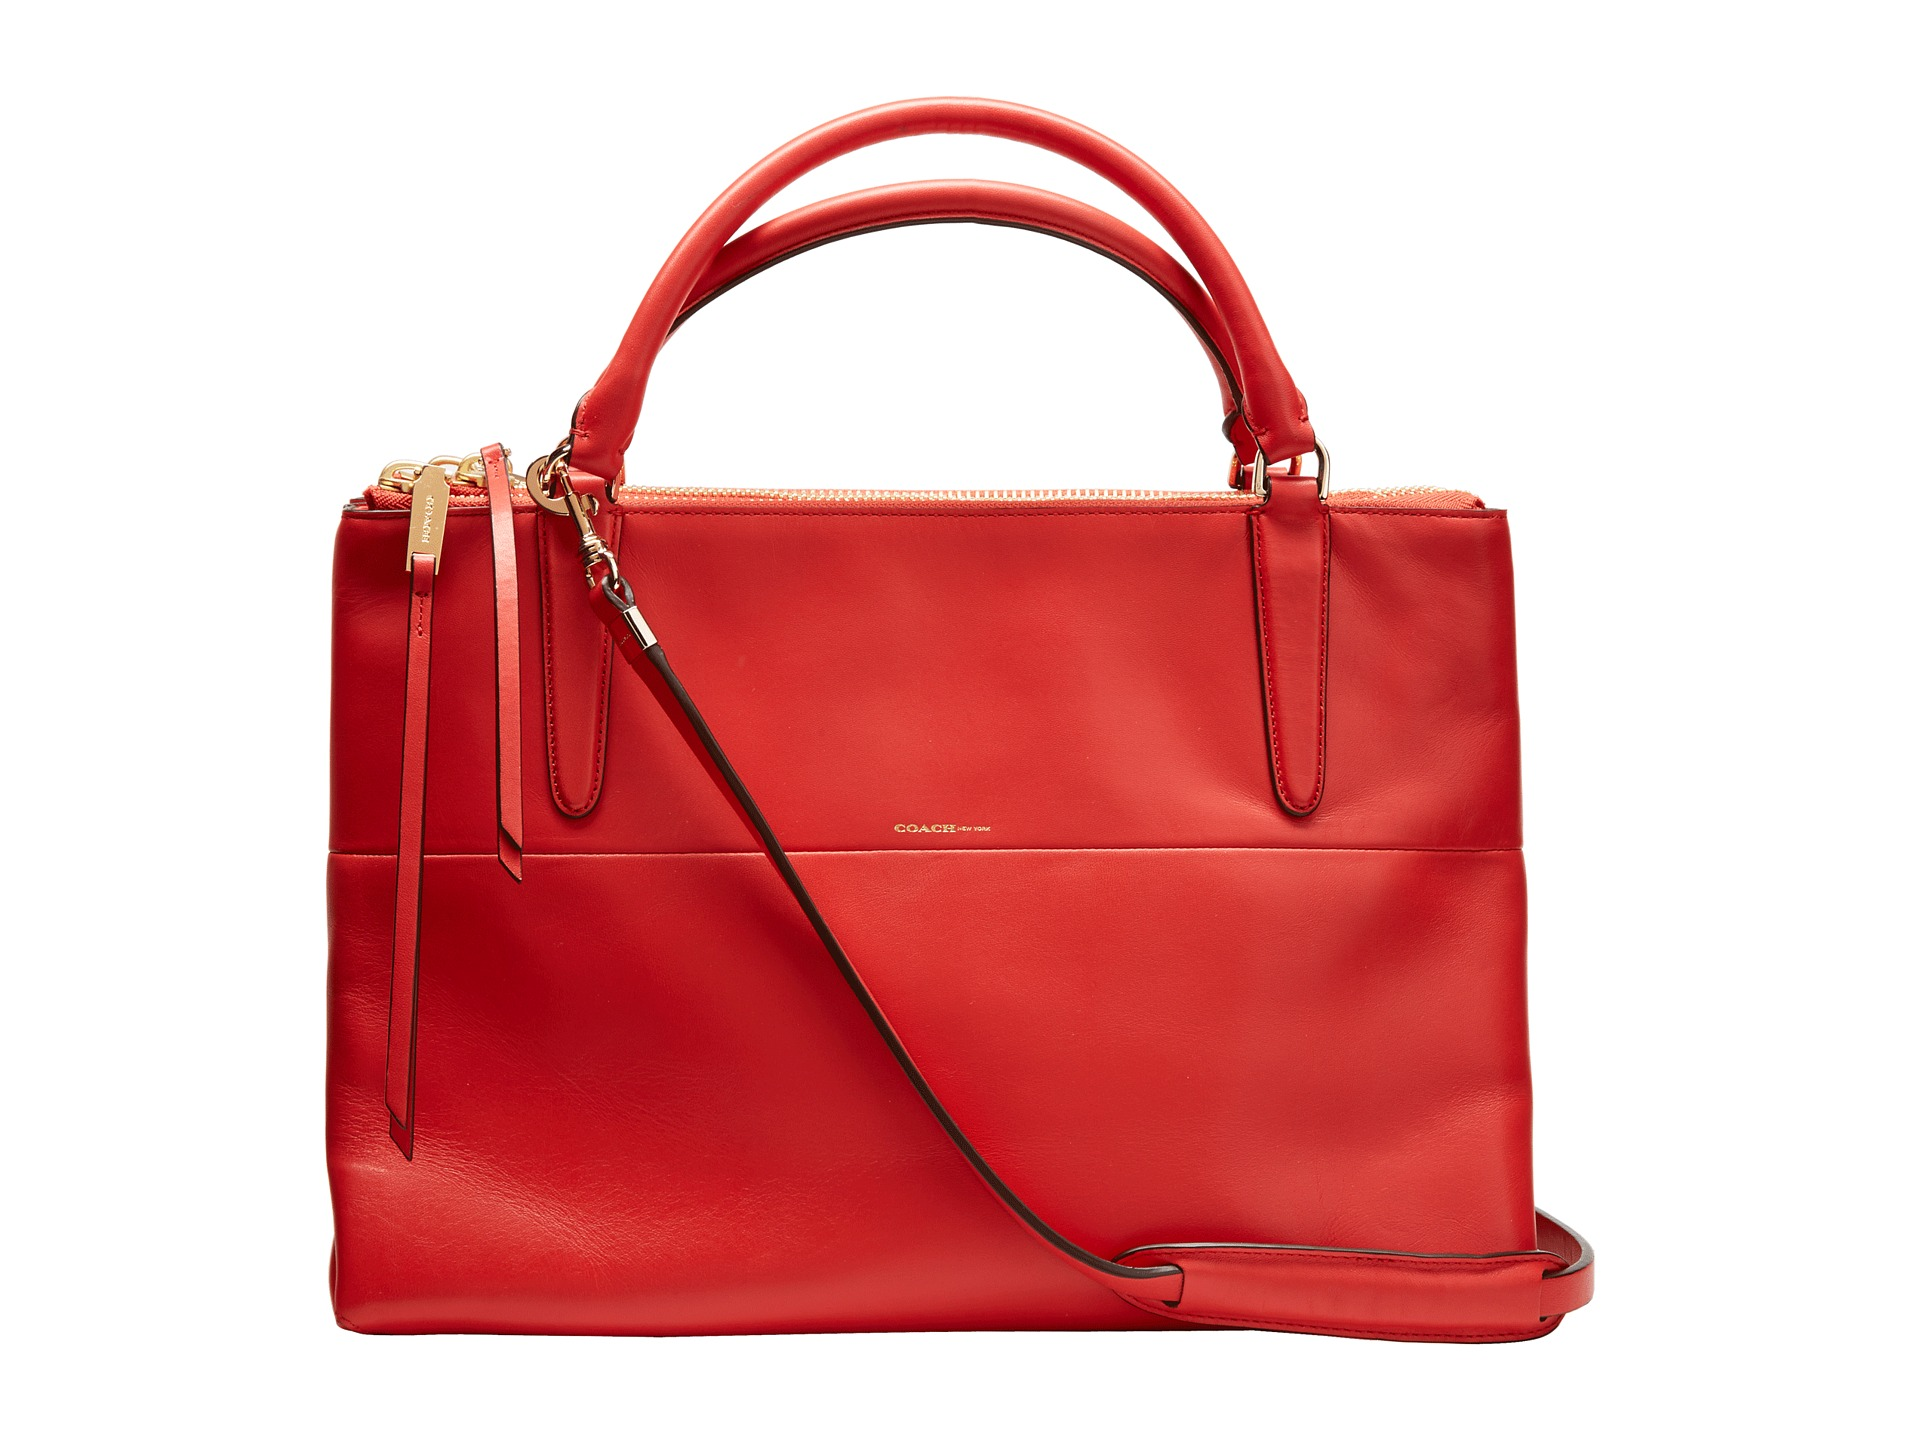 coach borough bag retro leather gold classic vermillion